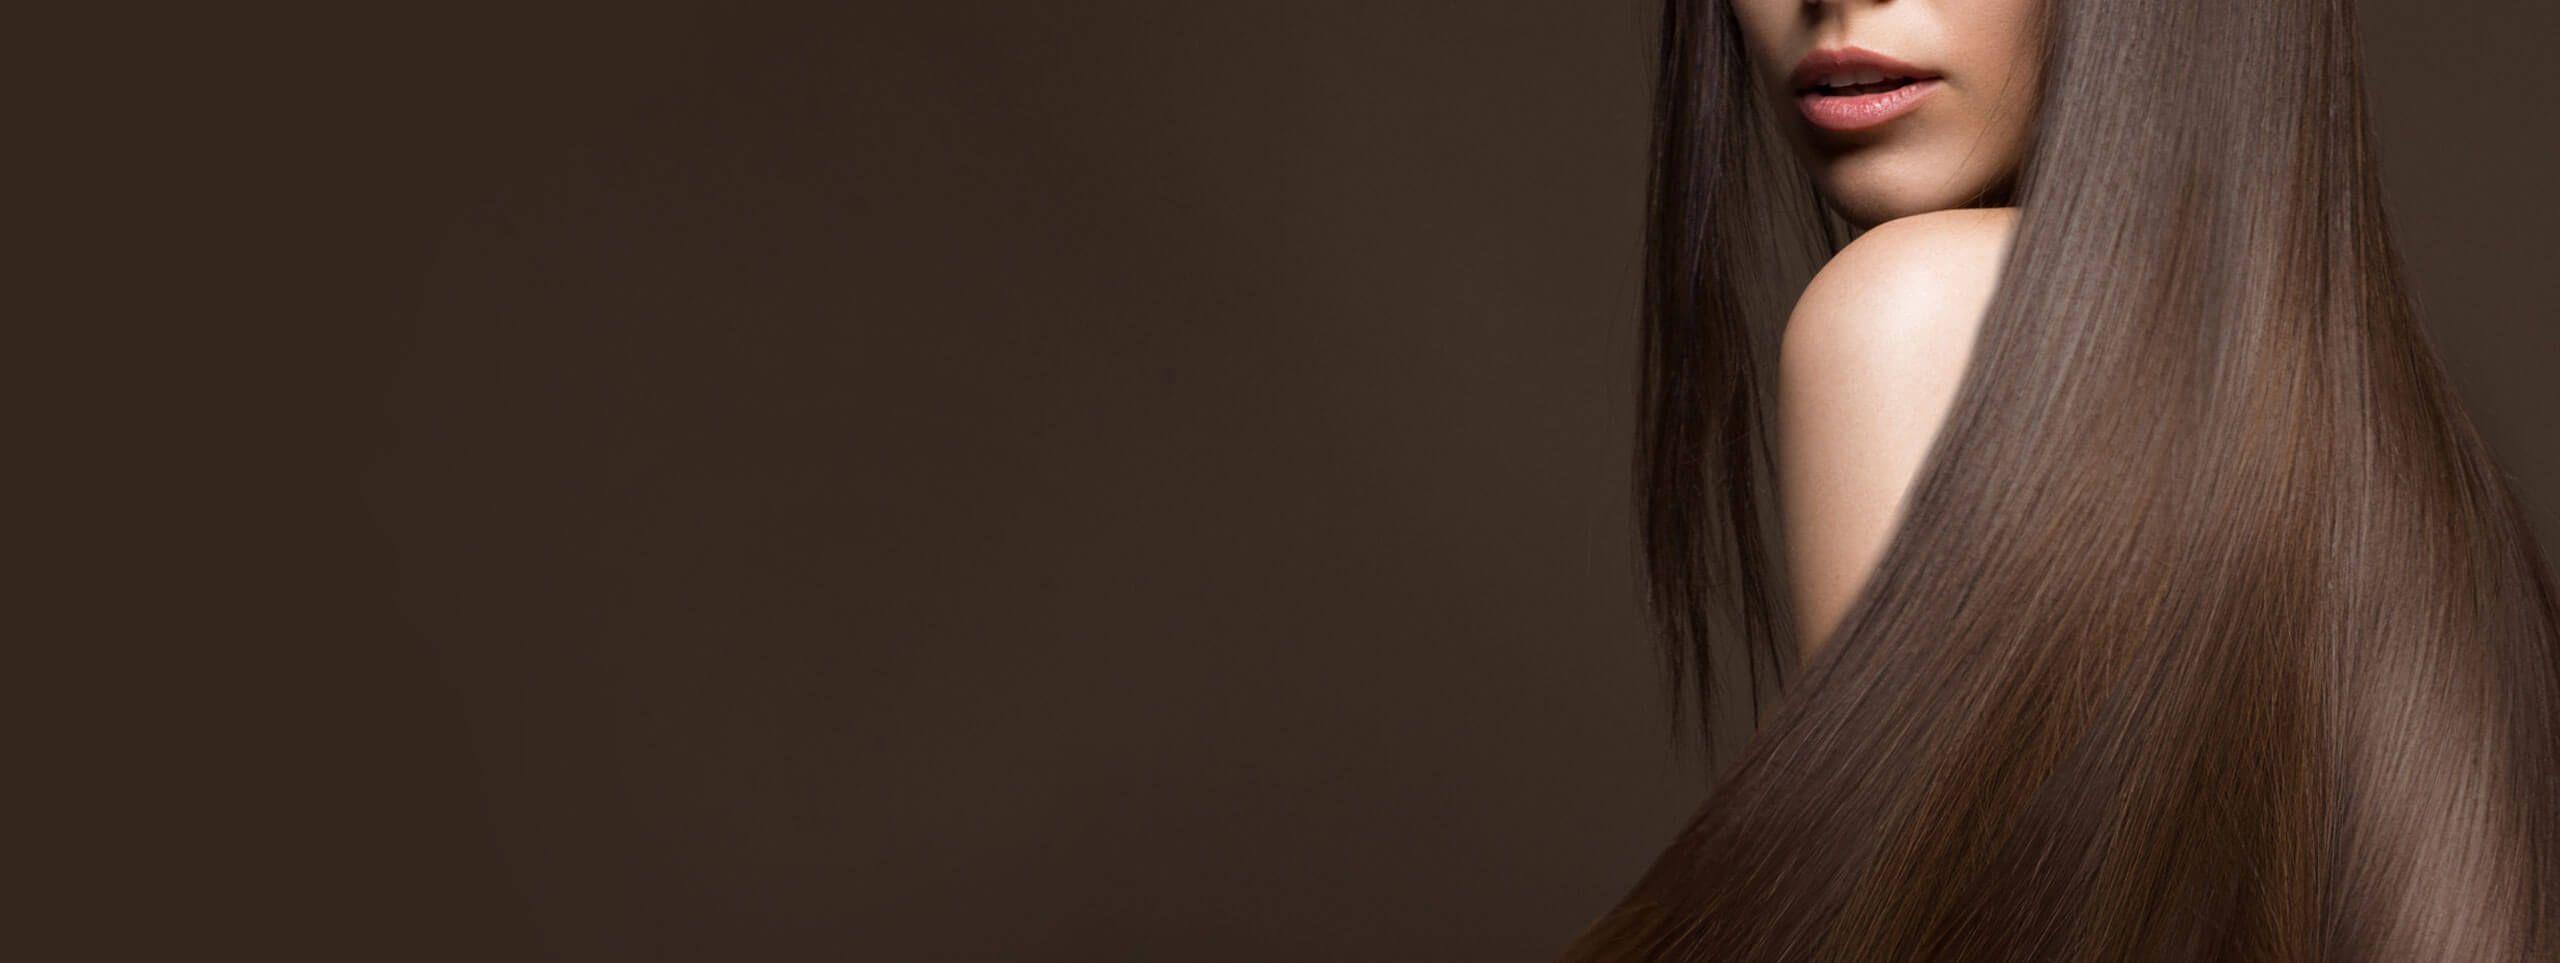 Brunette woman models long beautiful hair